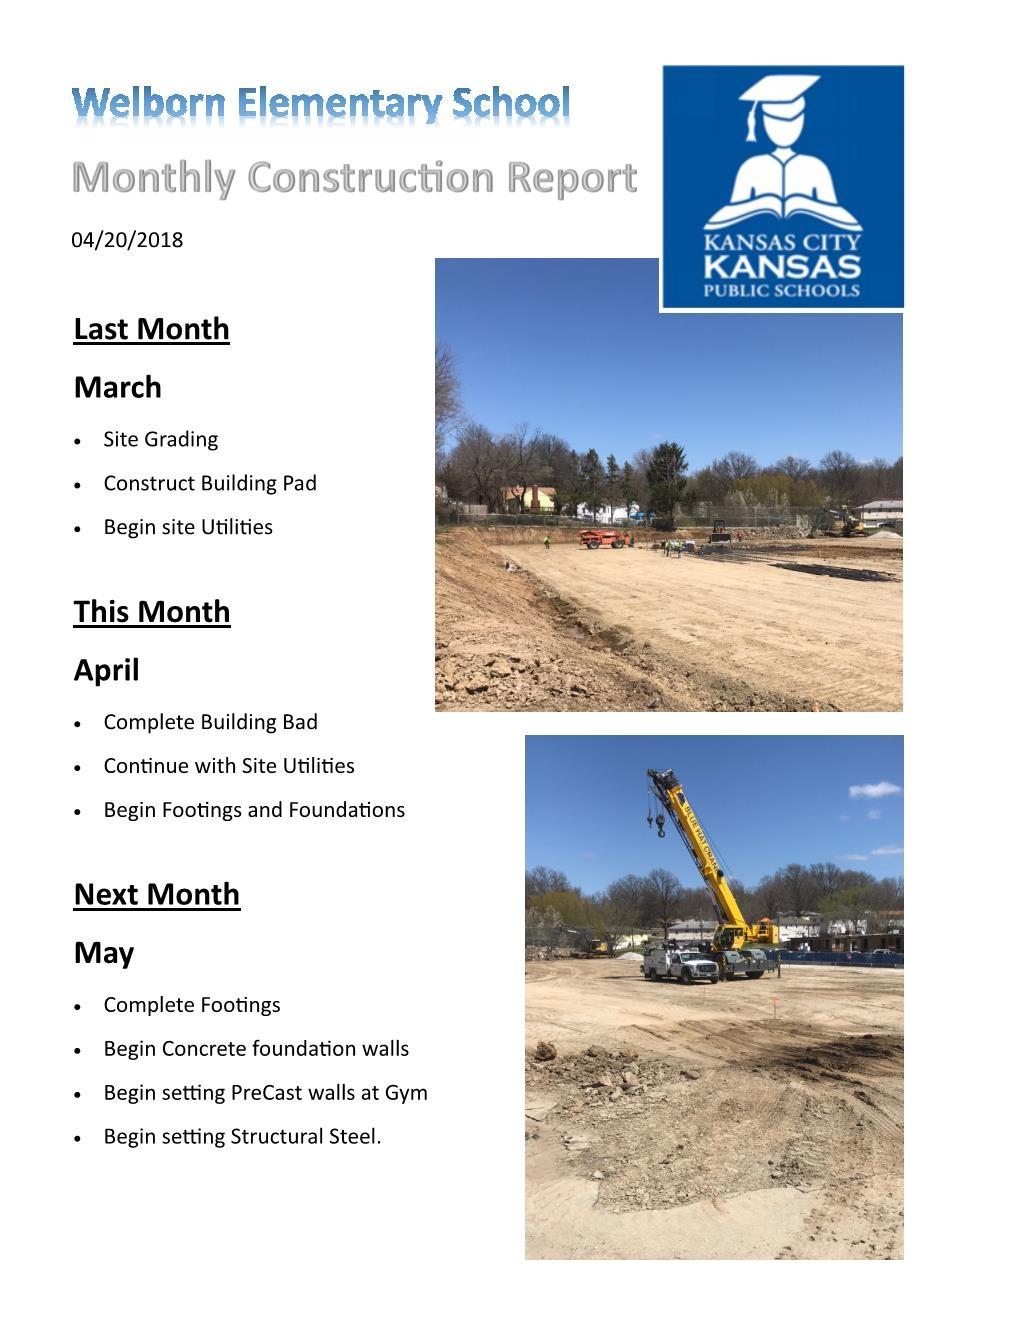 2018.04.16 WP08 April Monthy Report Welborn.jpg